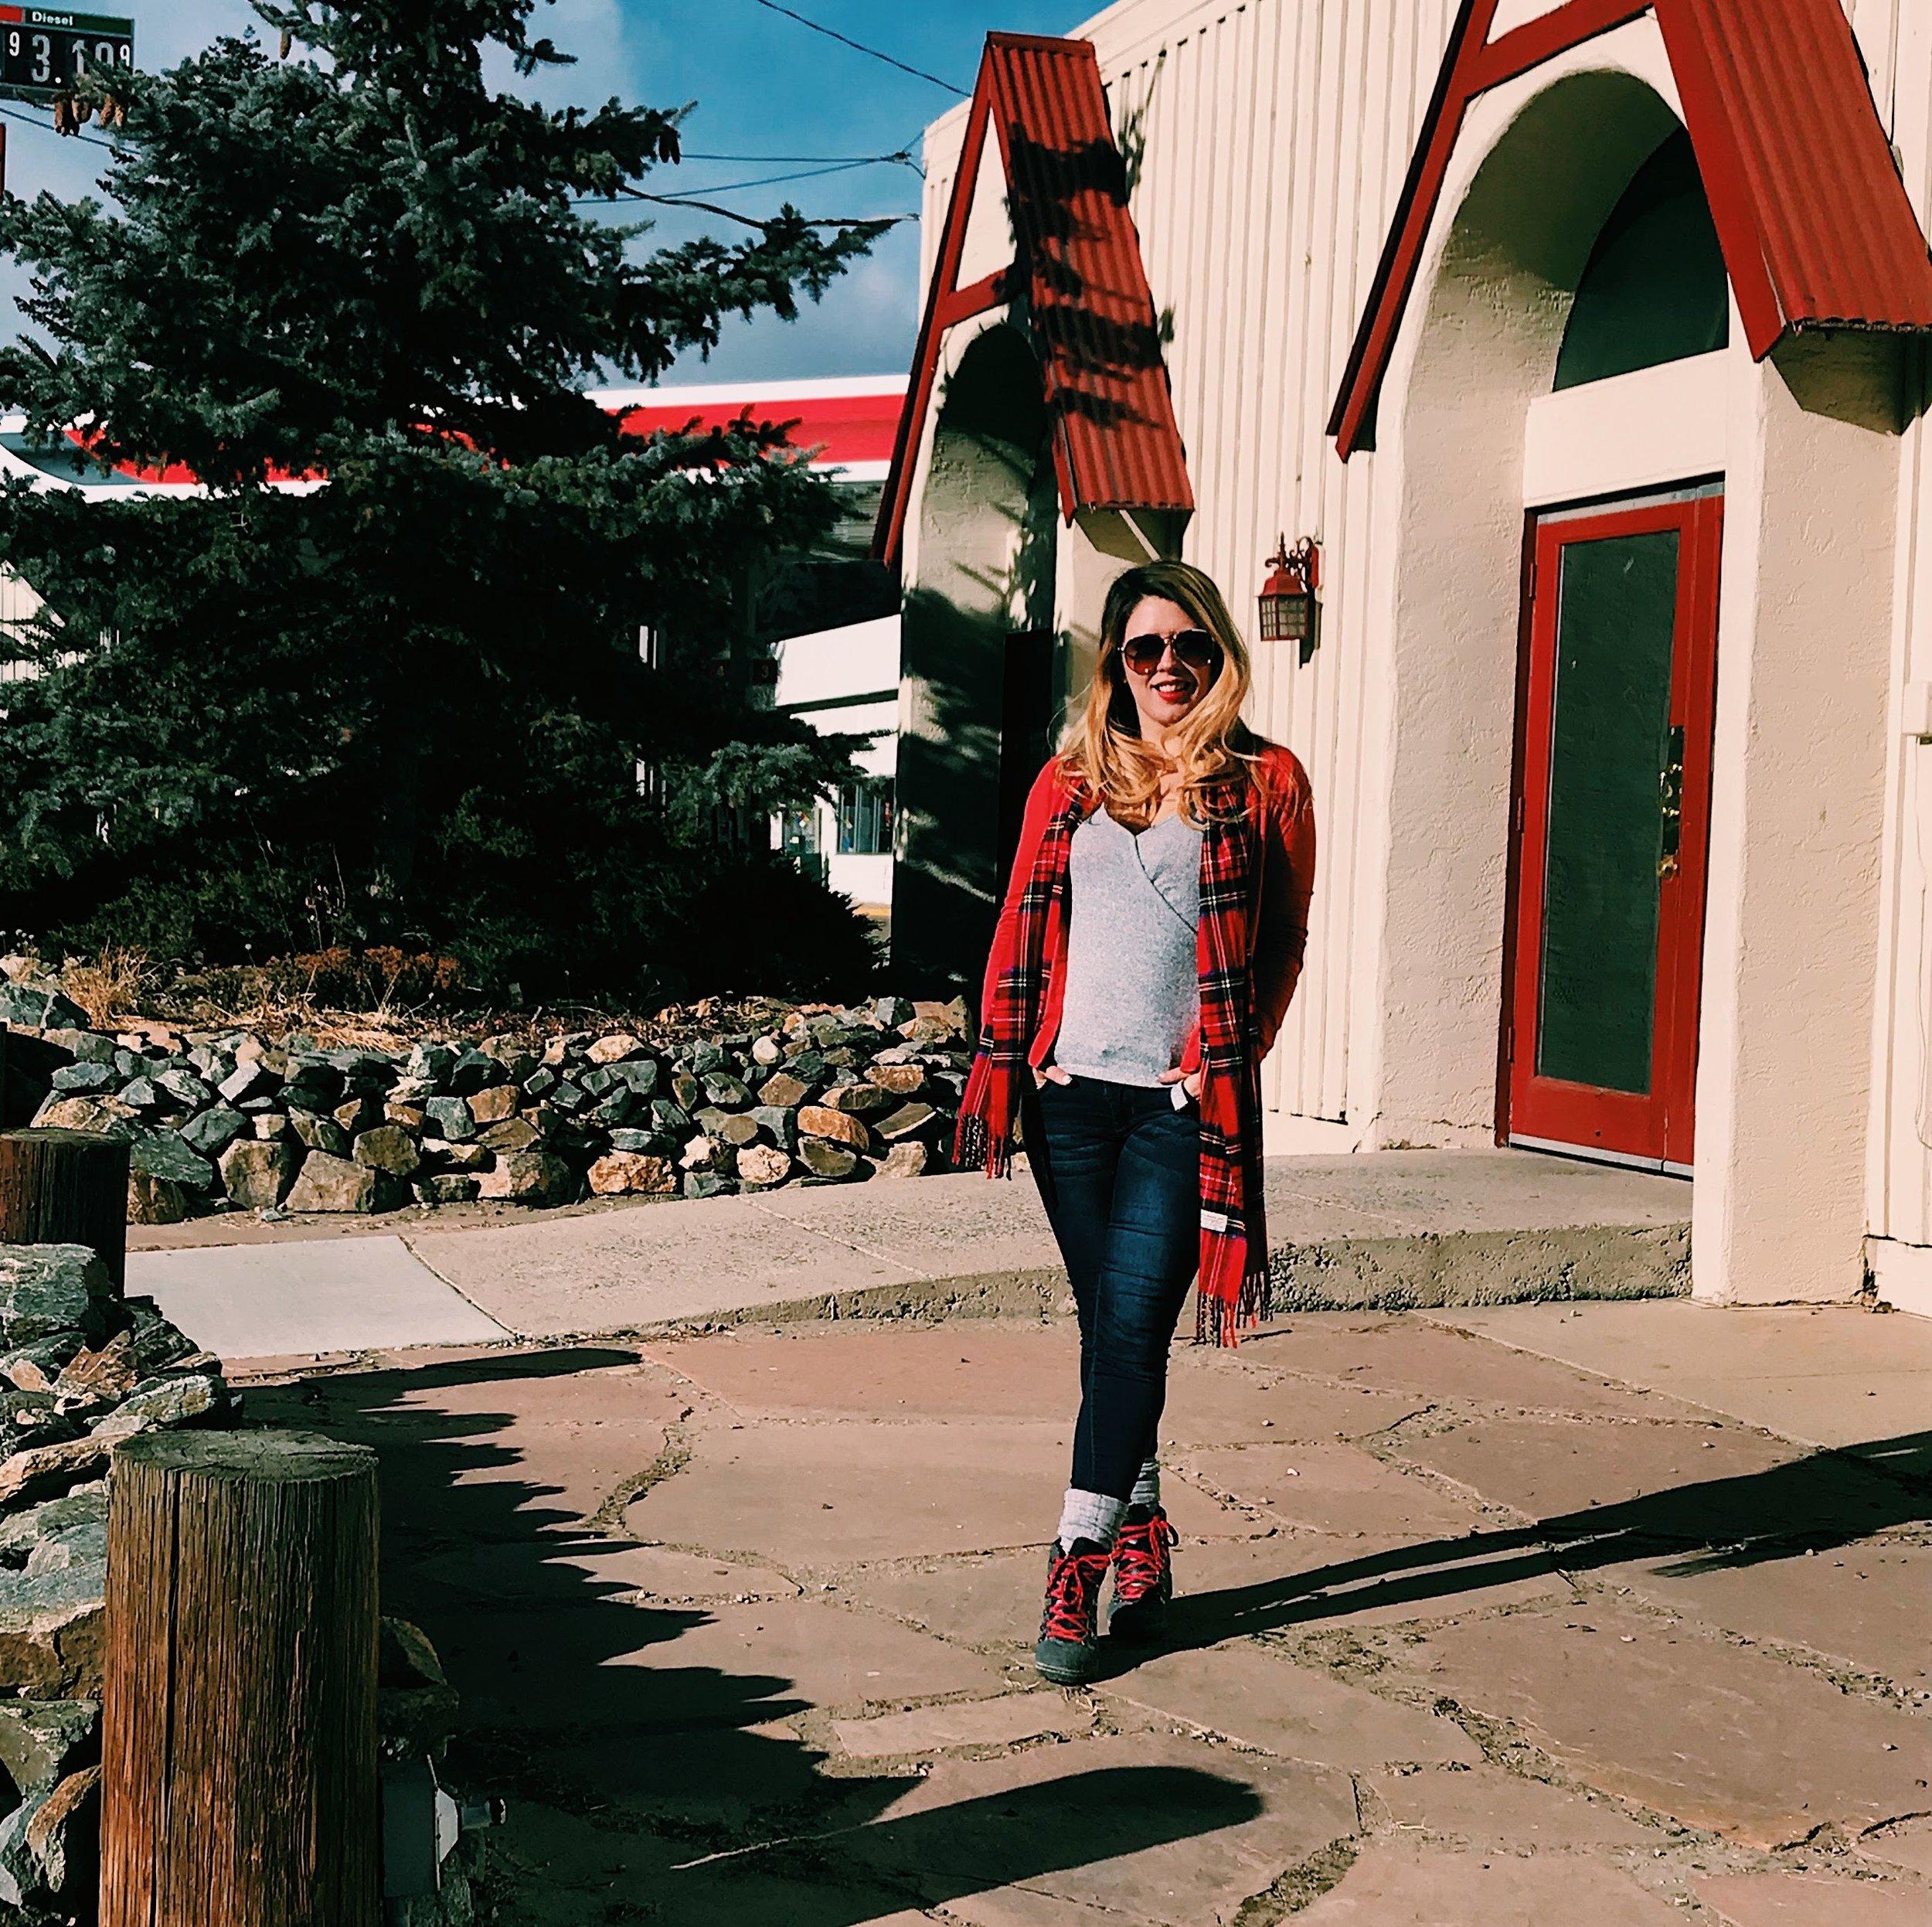 Three Heel Clicks - Small Town Charm - Idaho Springs - Colorado (7).jpg